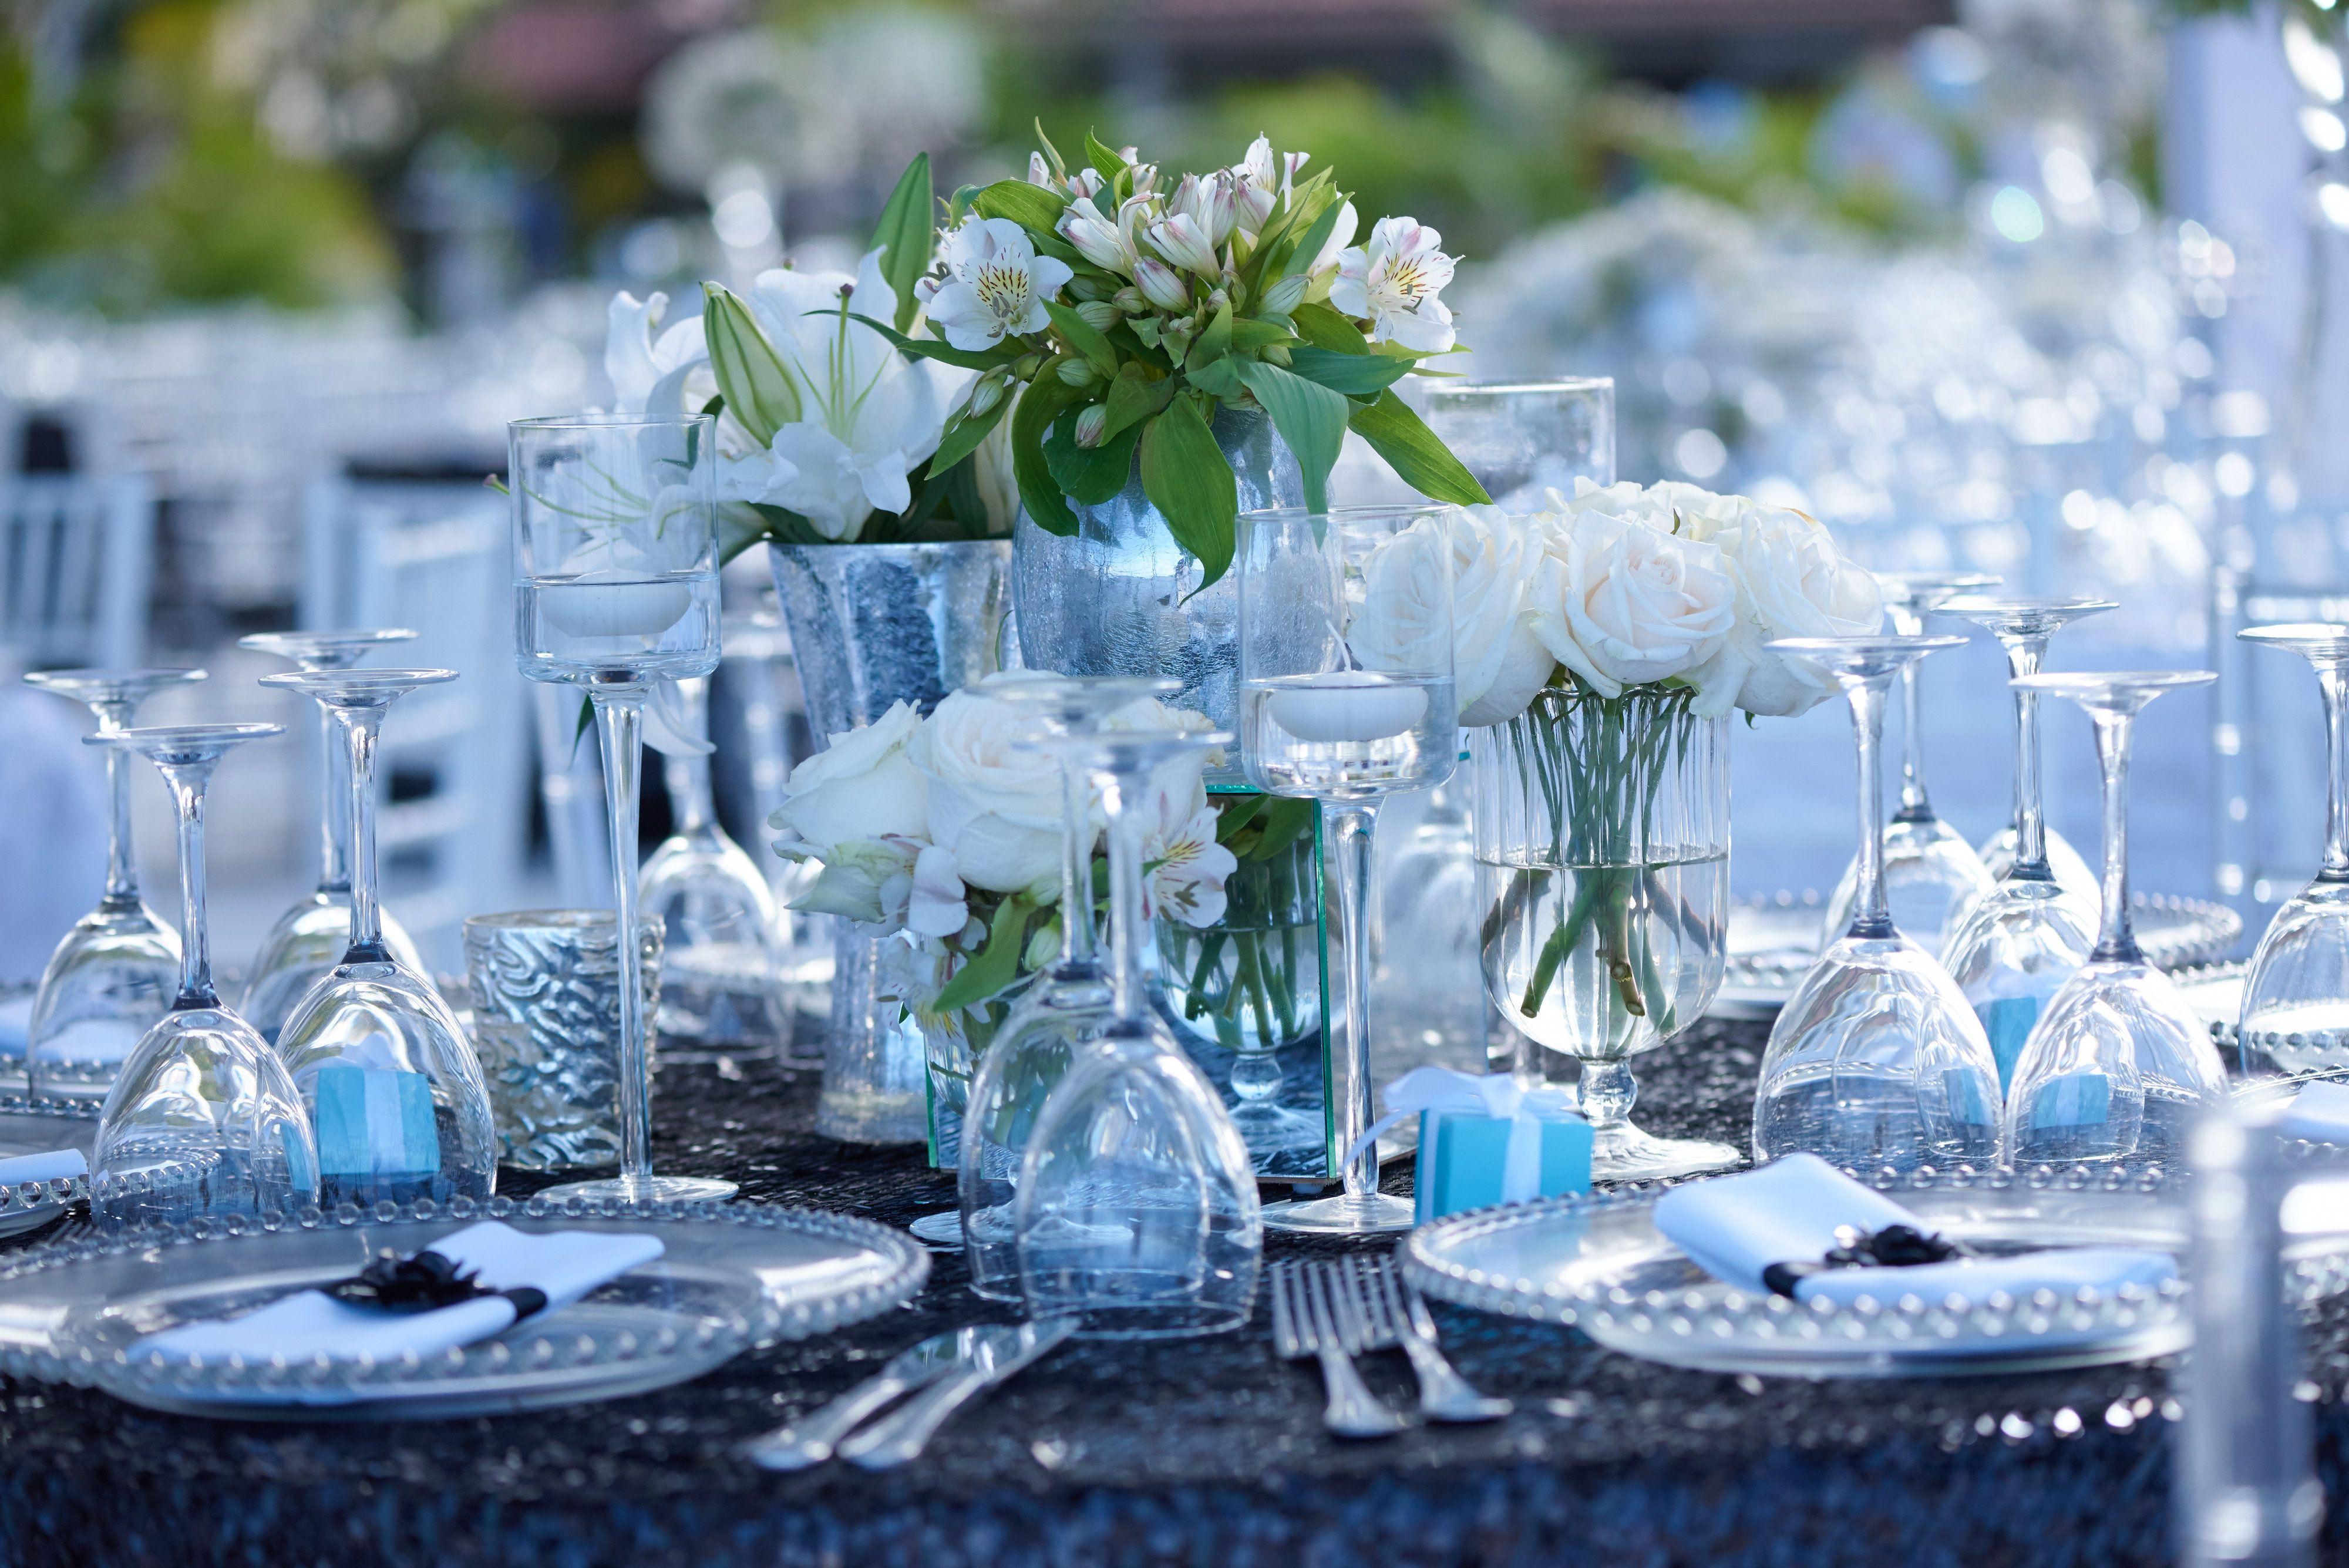 Elegant Wedding| Natural Flowers Decor| Guest Table Decor| Venue Kukua Punta Cana| Design Begokua| Photo by F3 Photography